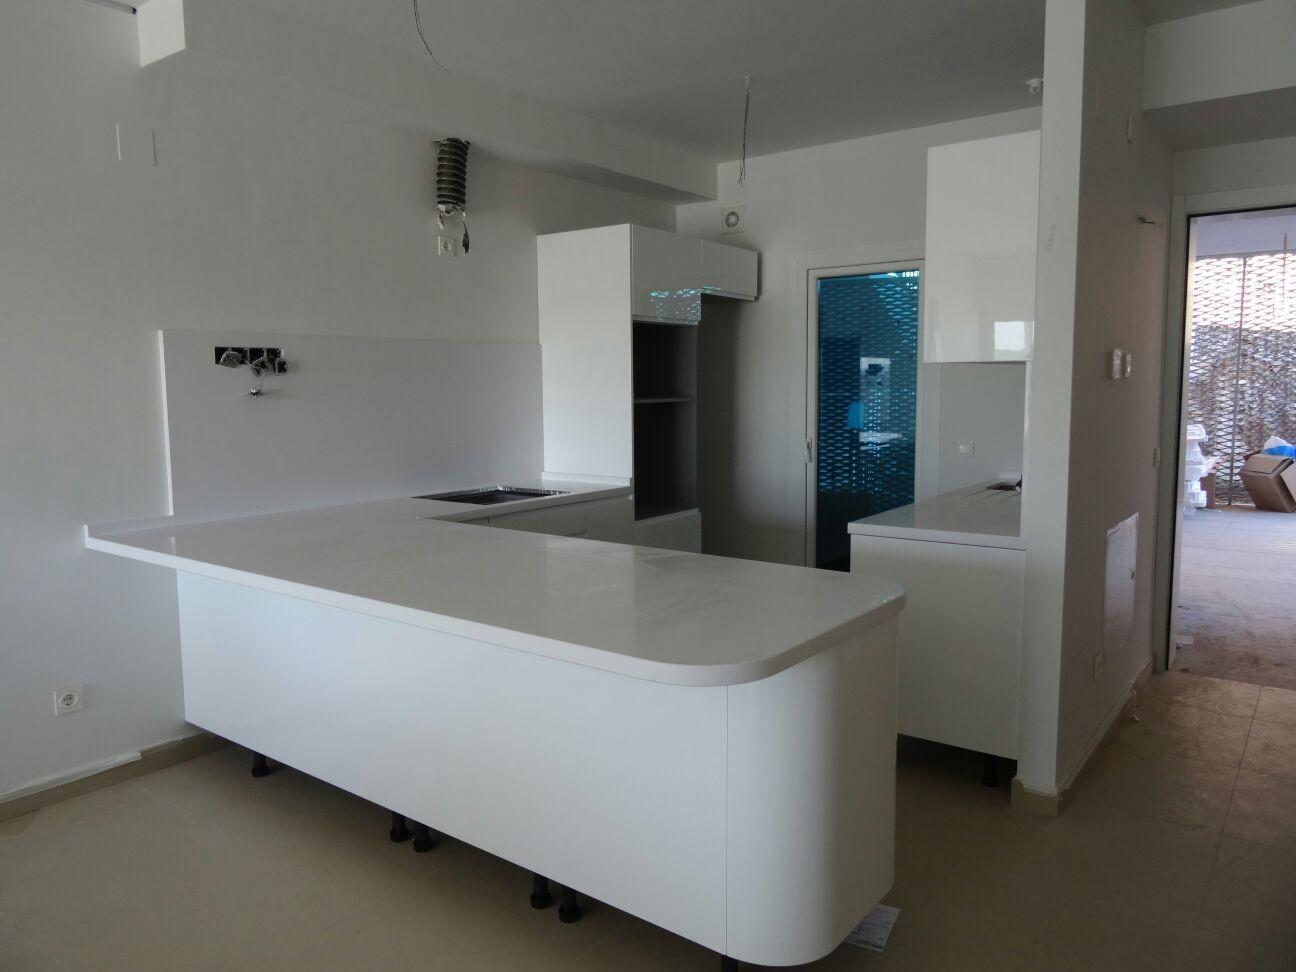 2 Bed Apartment in Benalmadena